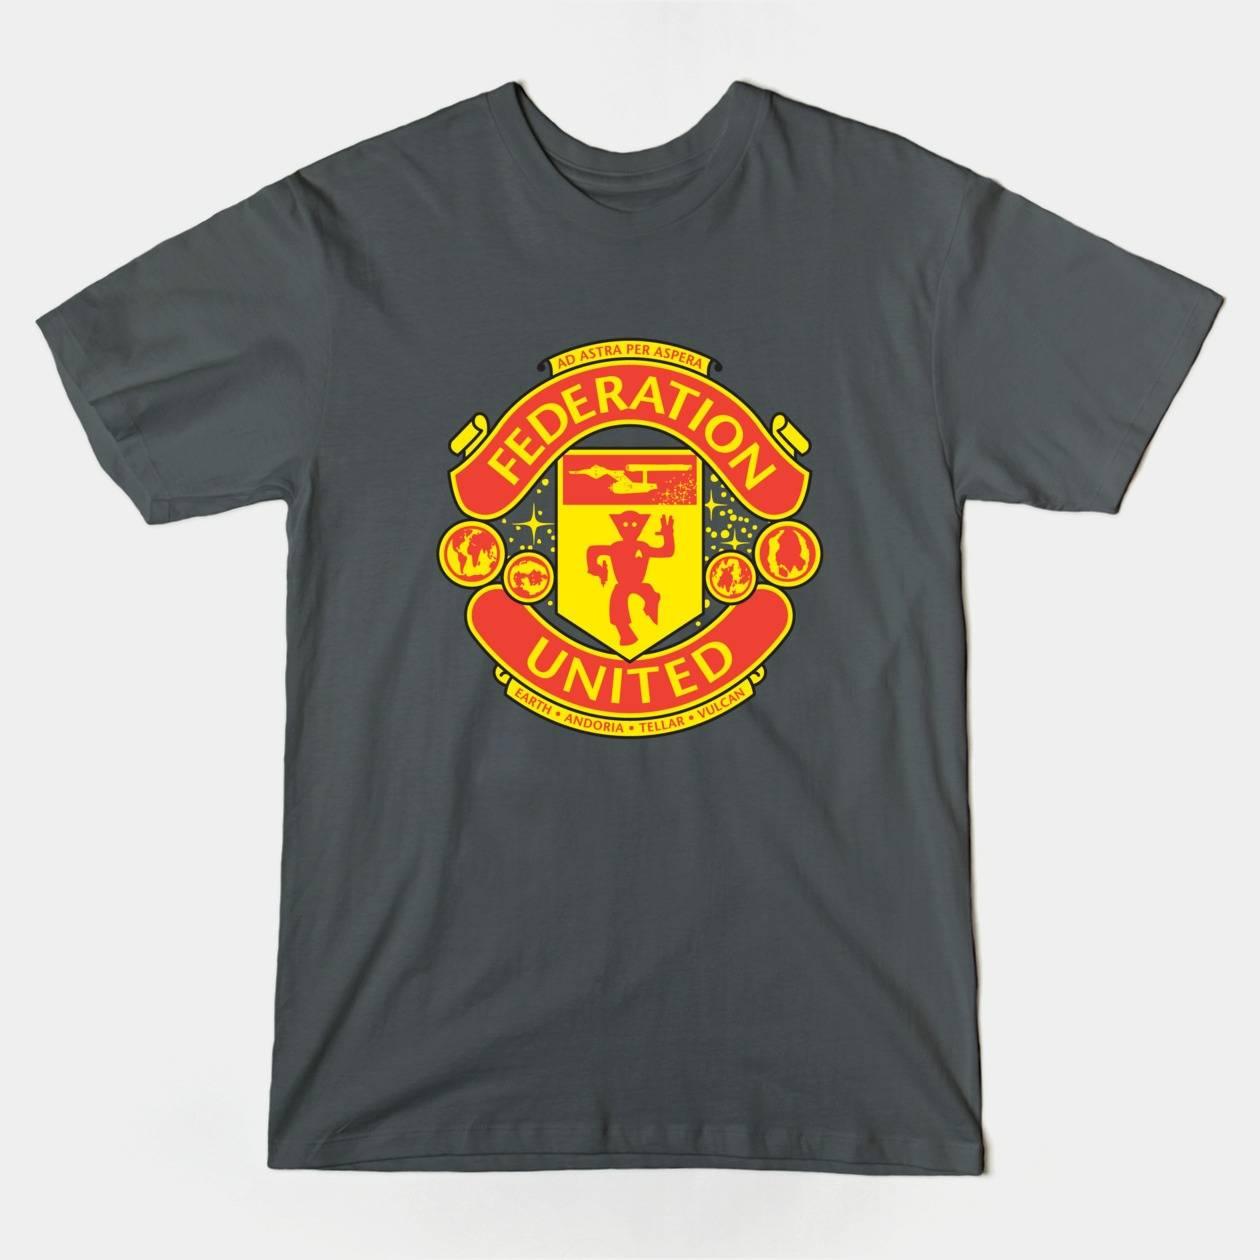 Federation United T Shirt The Shirt List